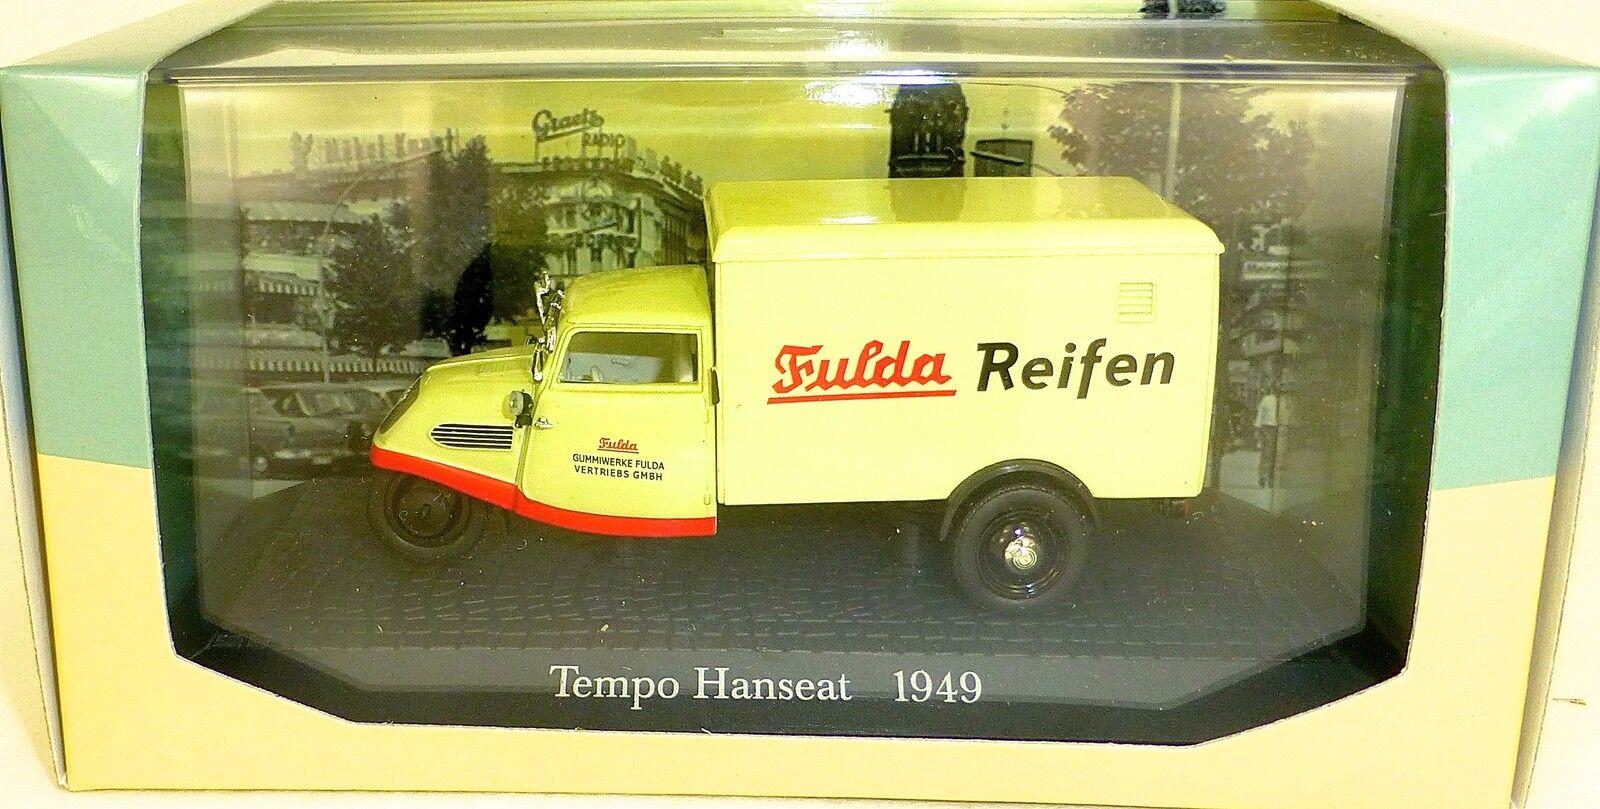 Tempo Hanseat 1949 Fulda Reifen 1 43 Atlas 7421108 Neuf en Boîte  Hs5 Μ